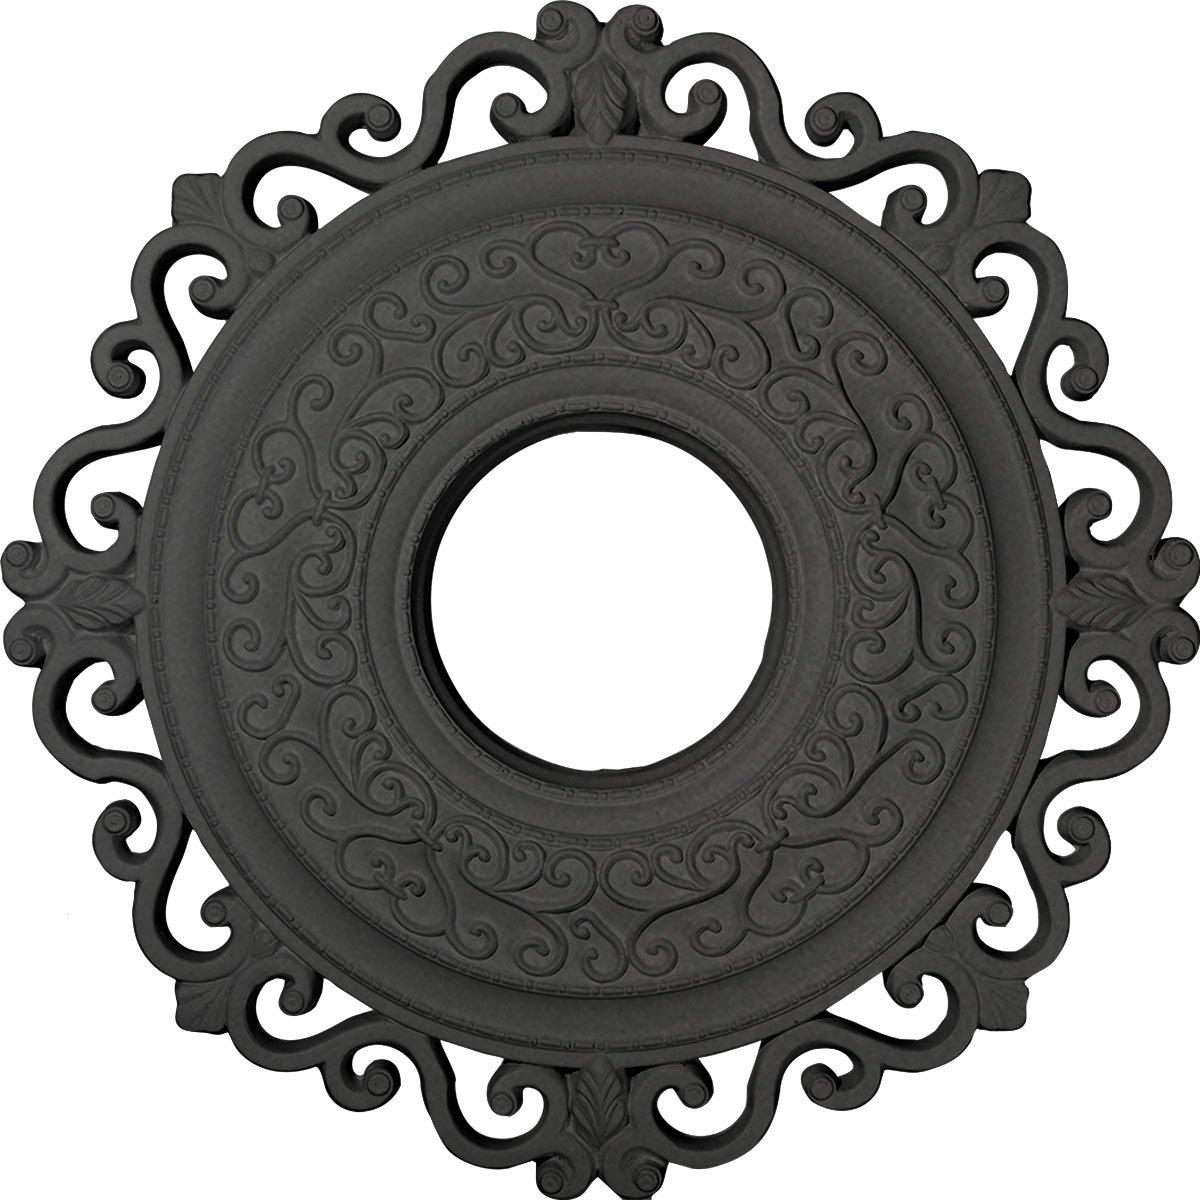 Ekena Millwork CM22ORSGS Orrington Ceiling Medallion, 22'' OD x 6 1/4'' ID x 1 3/4'' P, Steel Gray